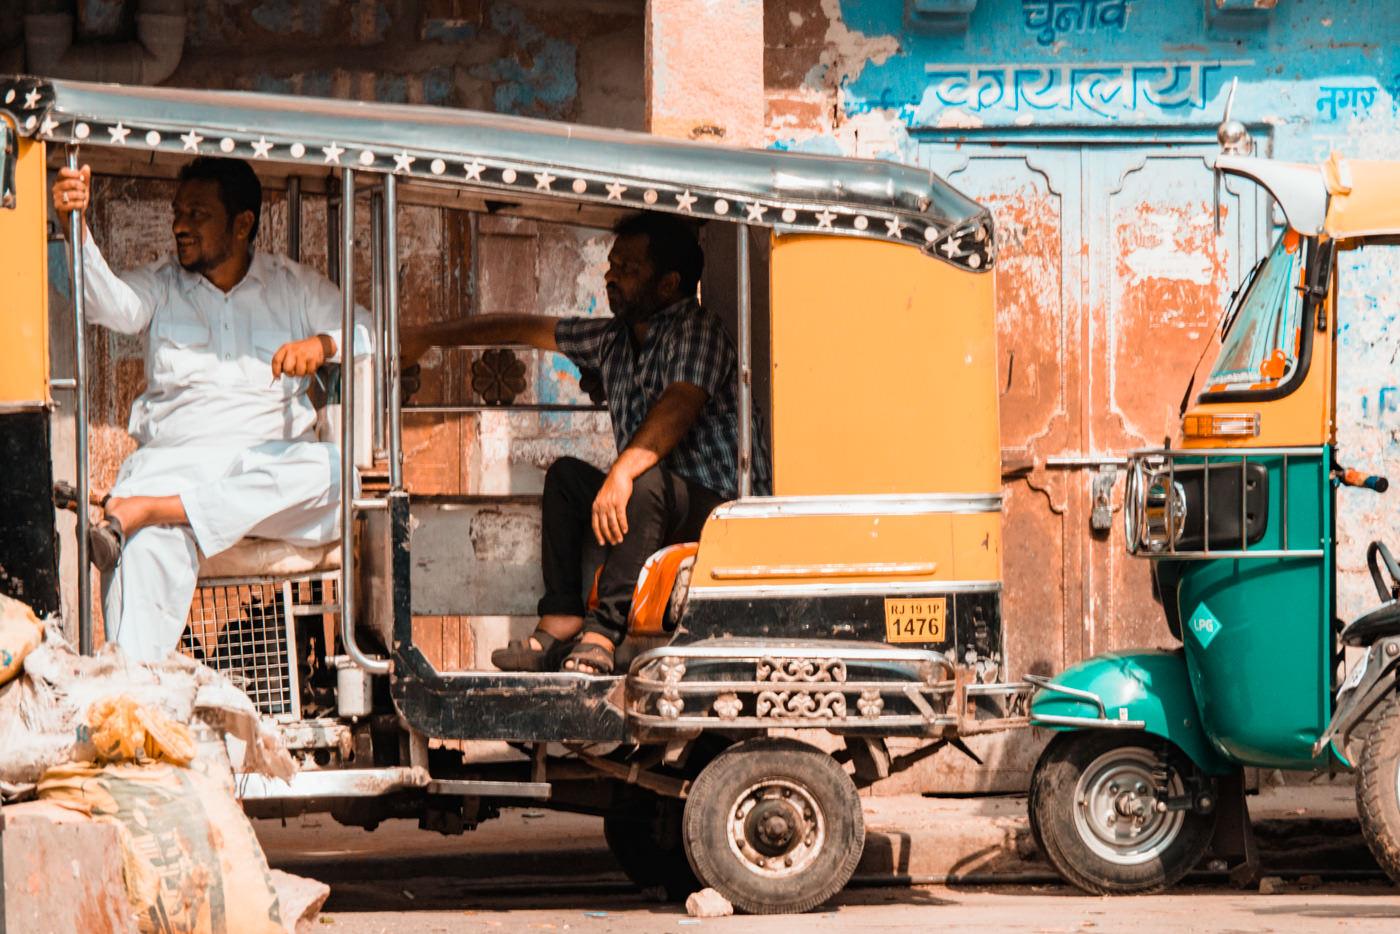 Rikschafahrer in Jodhpur